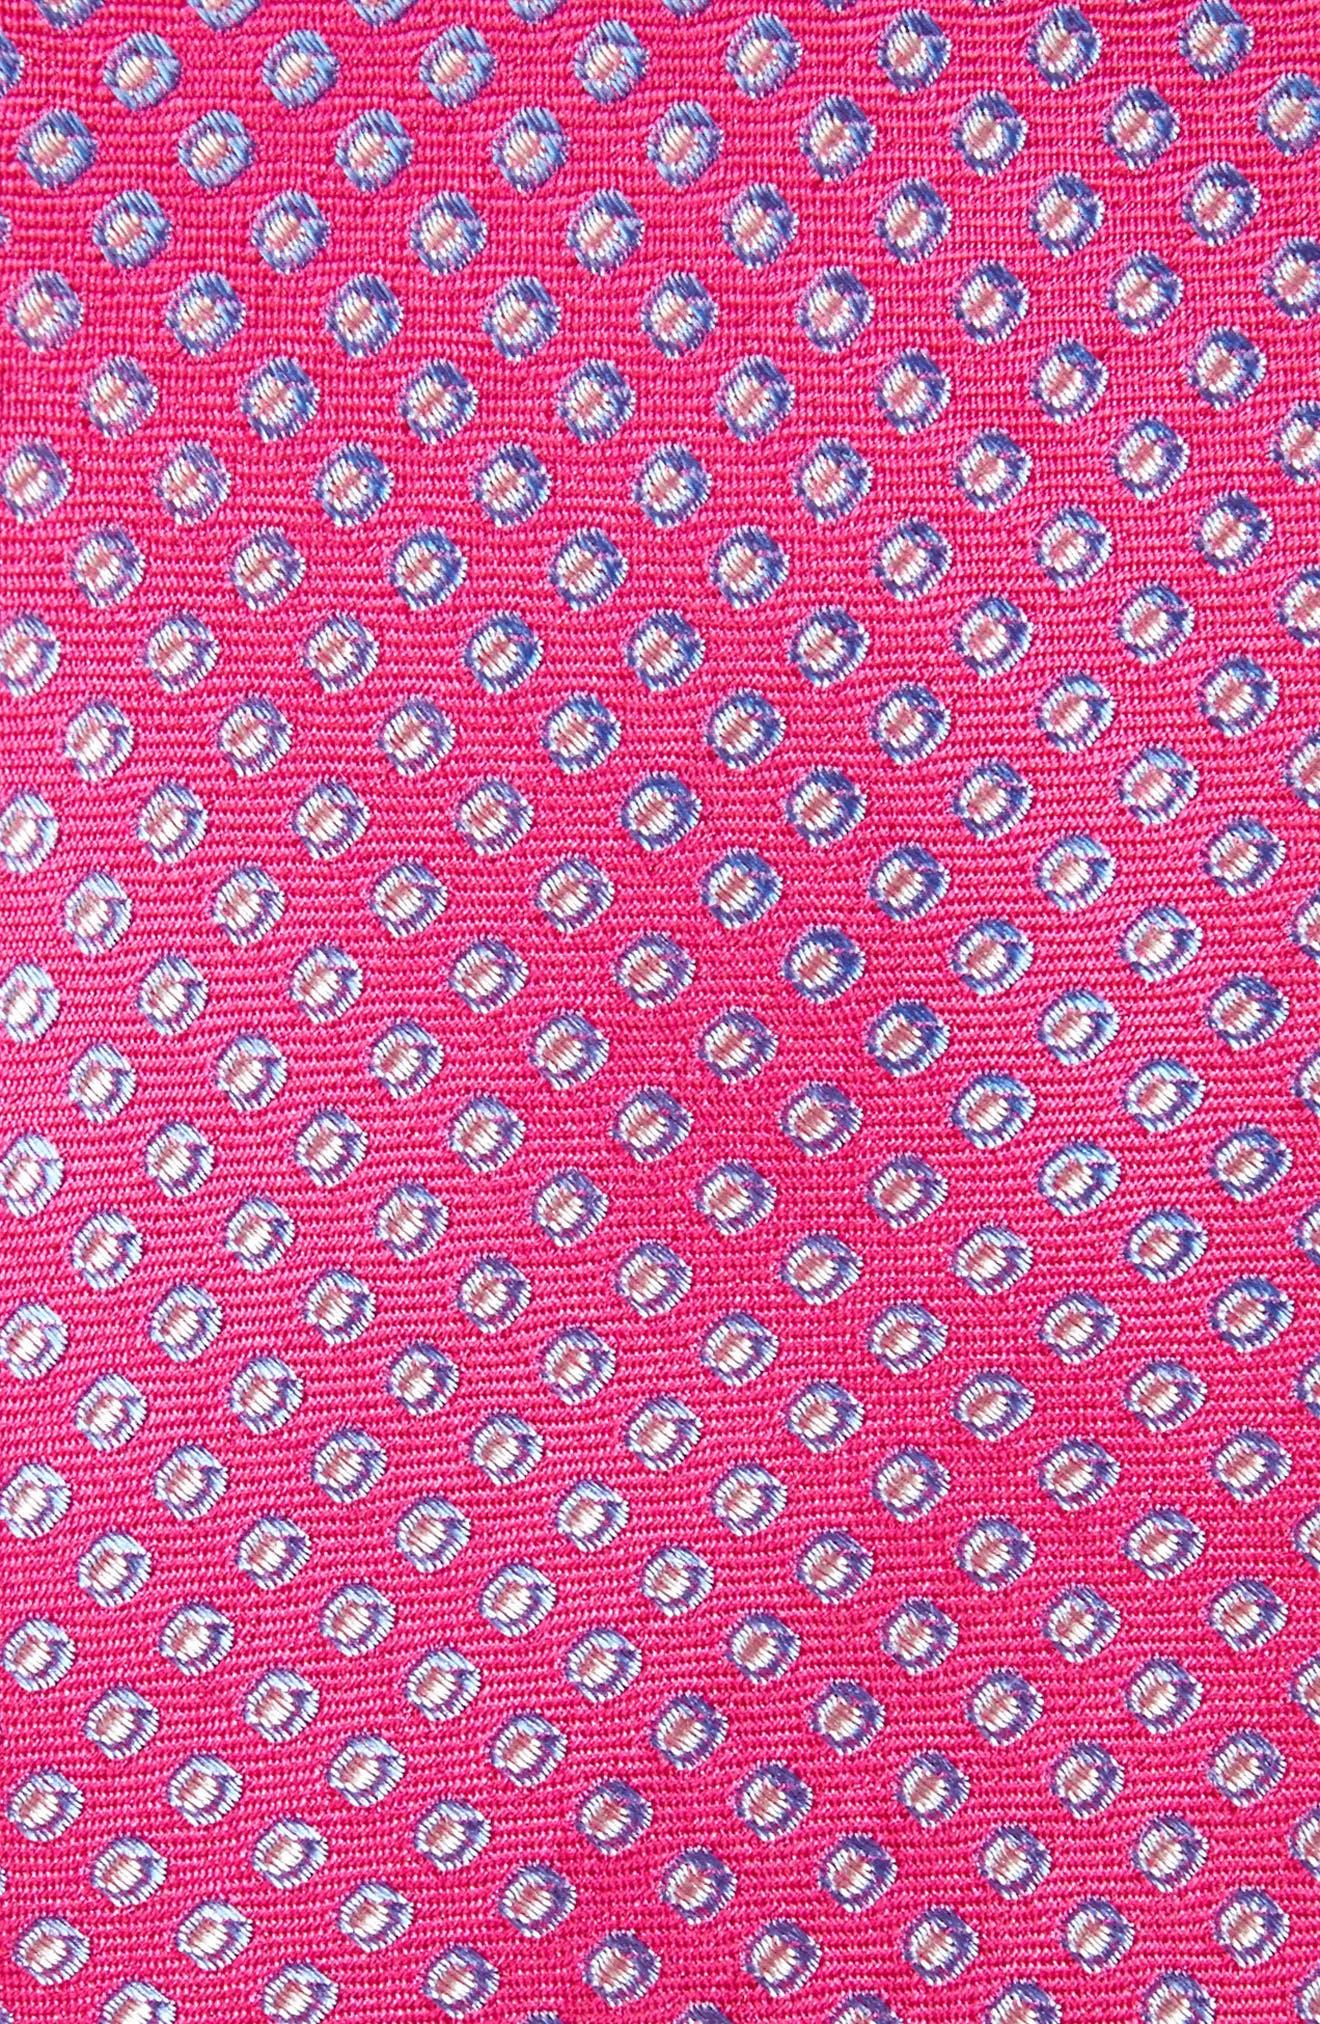 Oxford Dot Silk Tie,                             Alternate thumbnail 14, color,